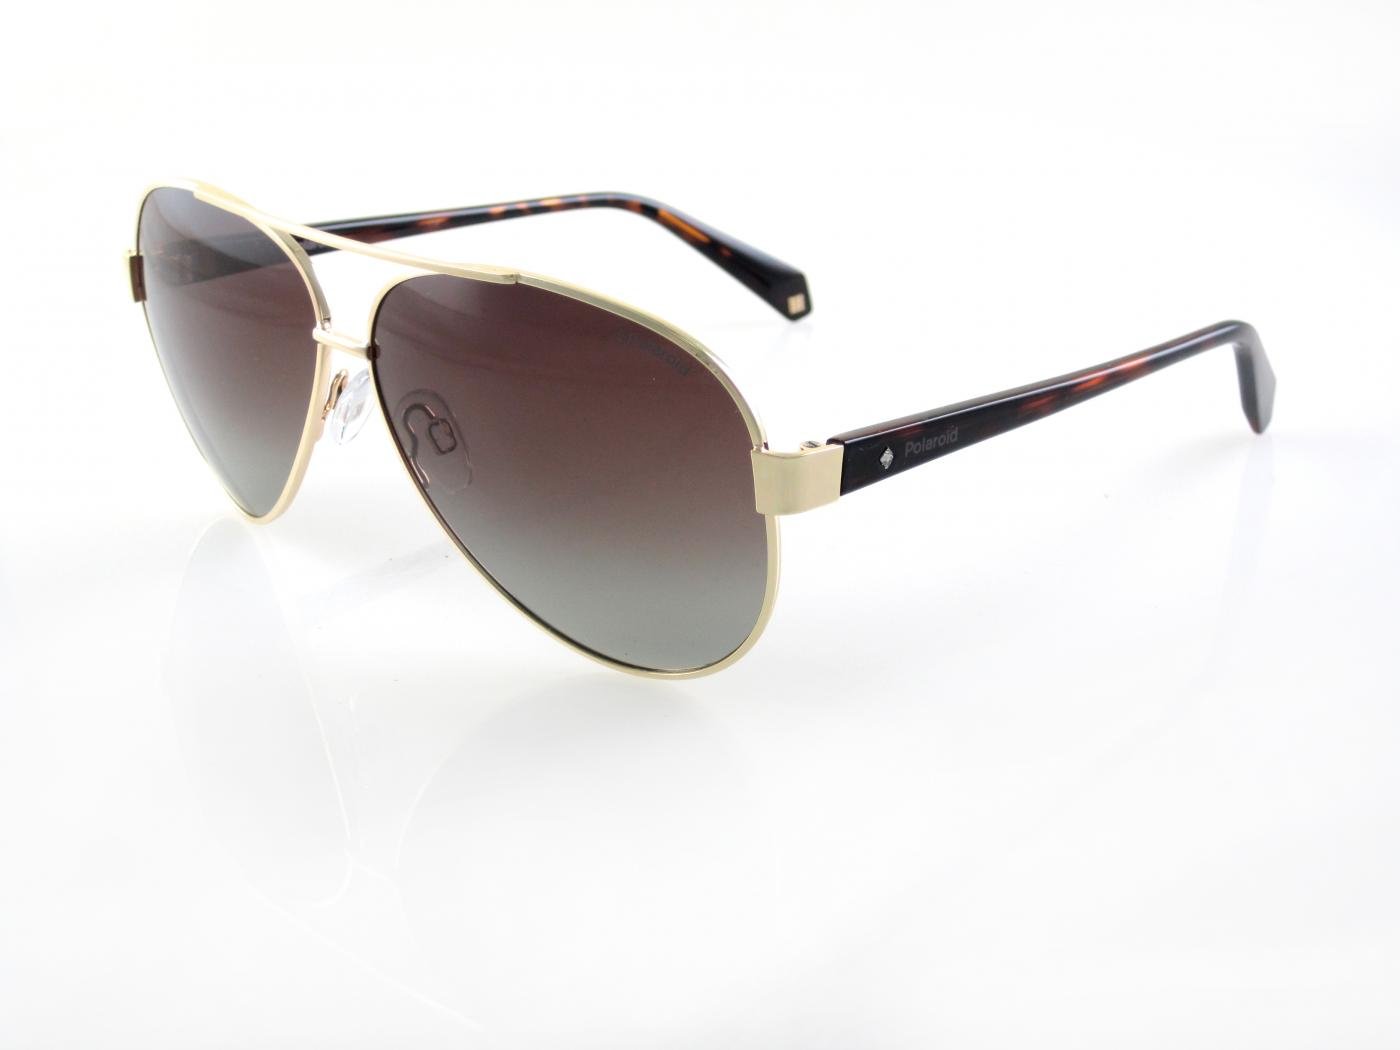 b7170e85c Unisex slnečné okuliare Polaroid   oftalens.sk